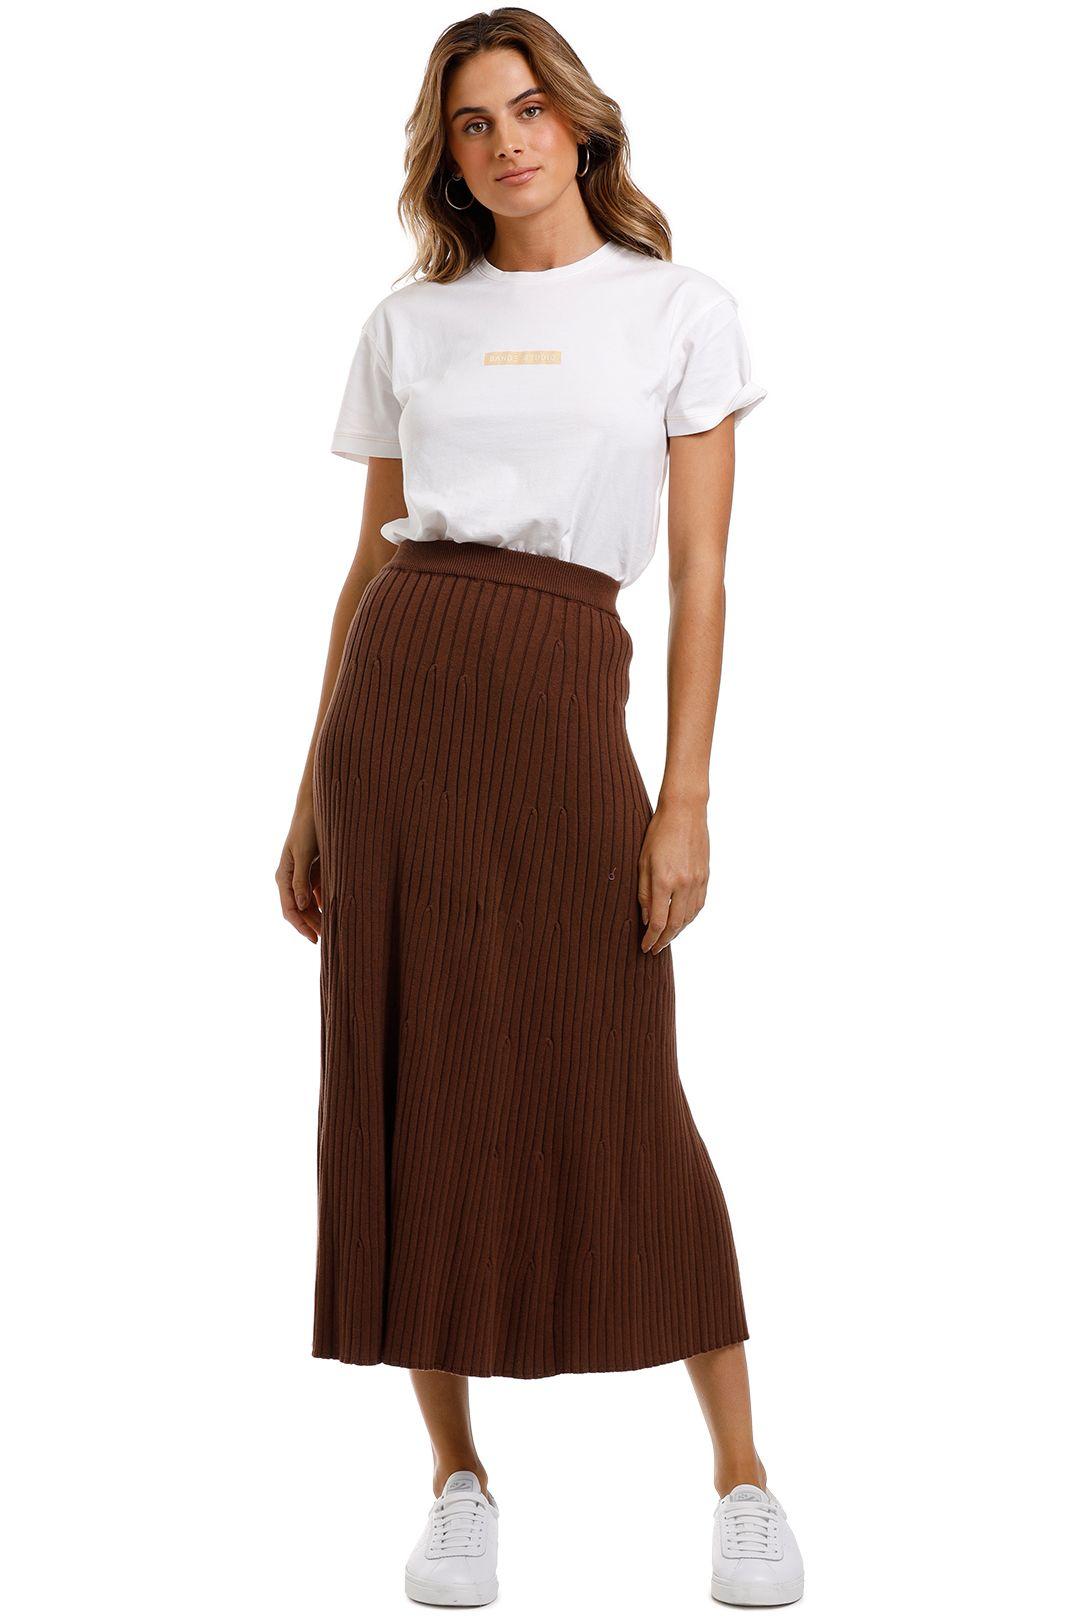 Jillian Boustred Oscar Ribbed Skirt Knit